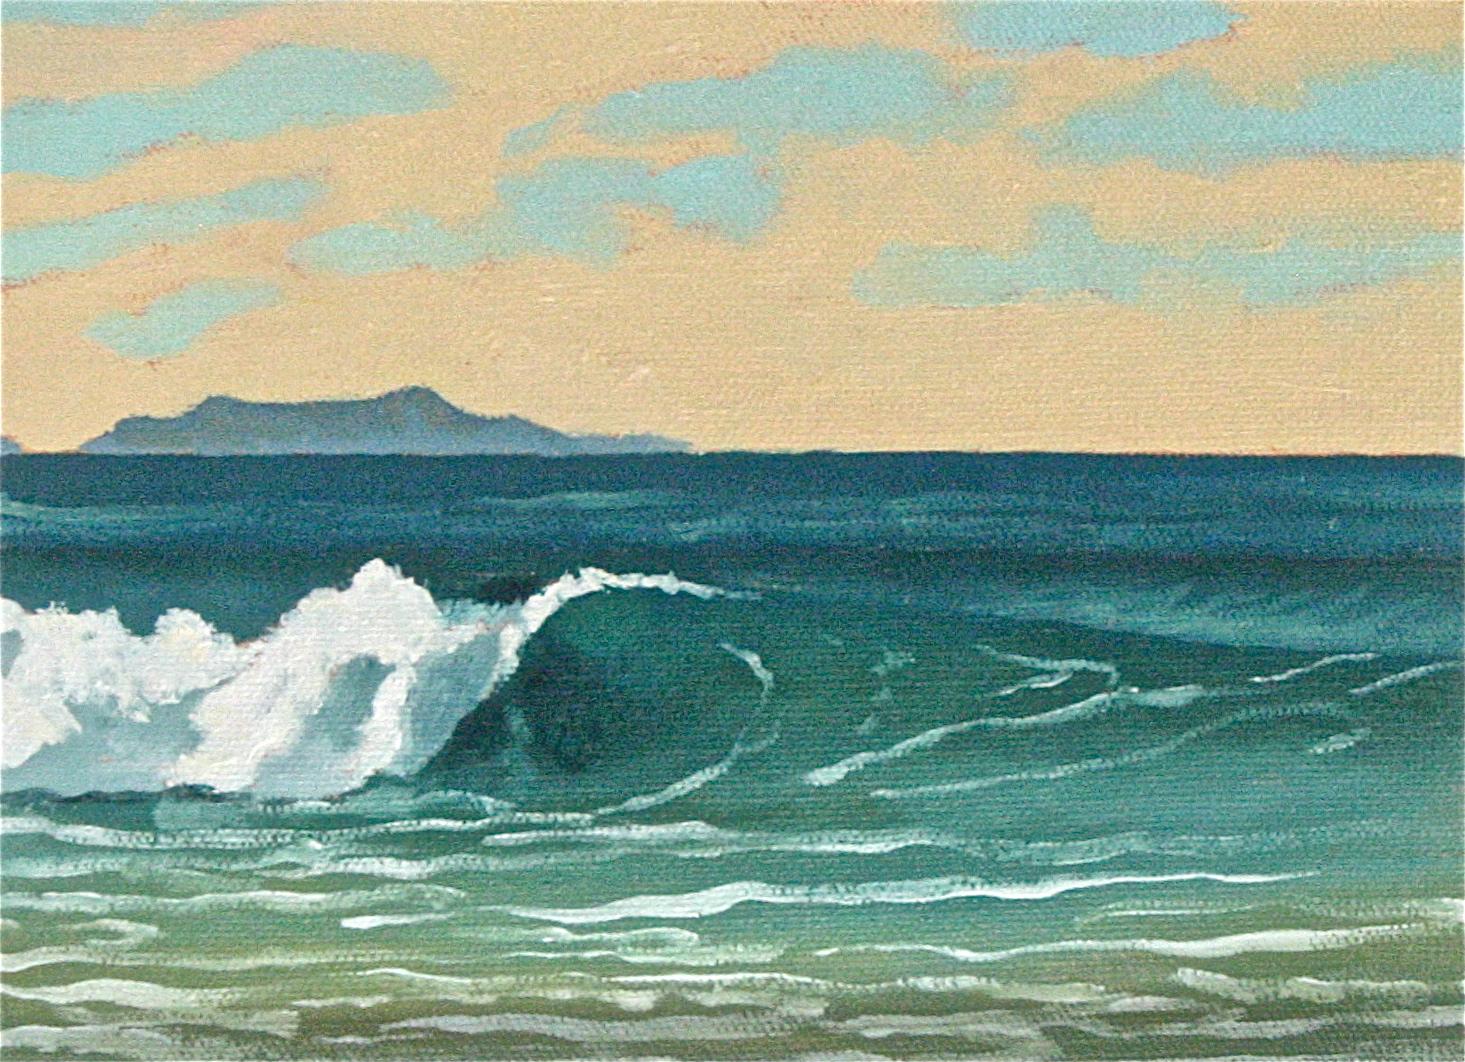 """Pierpont Left"" oil on canvas 5 x 7 sold"